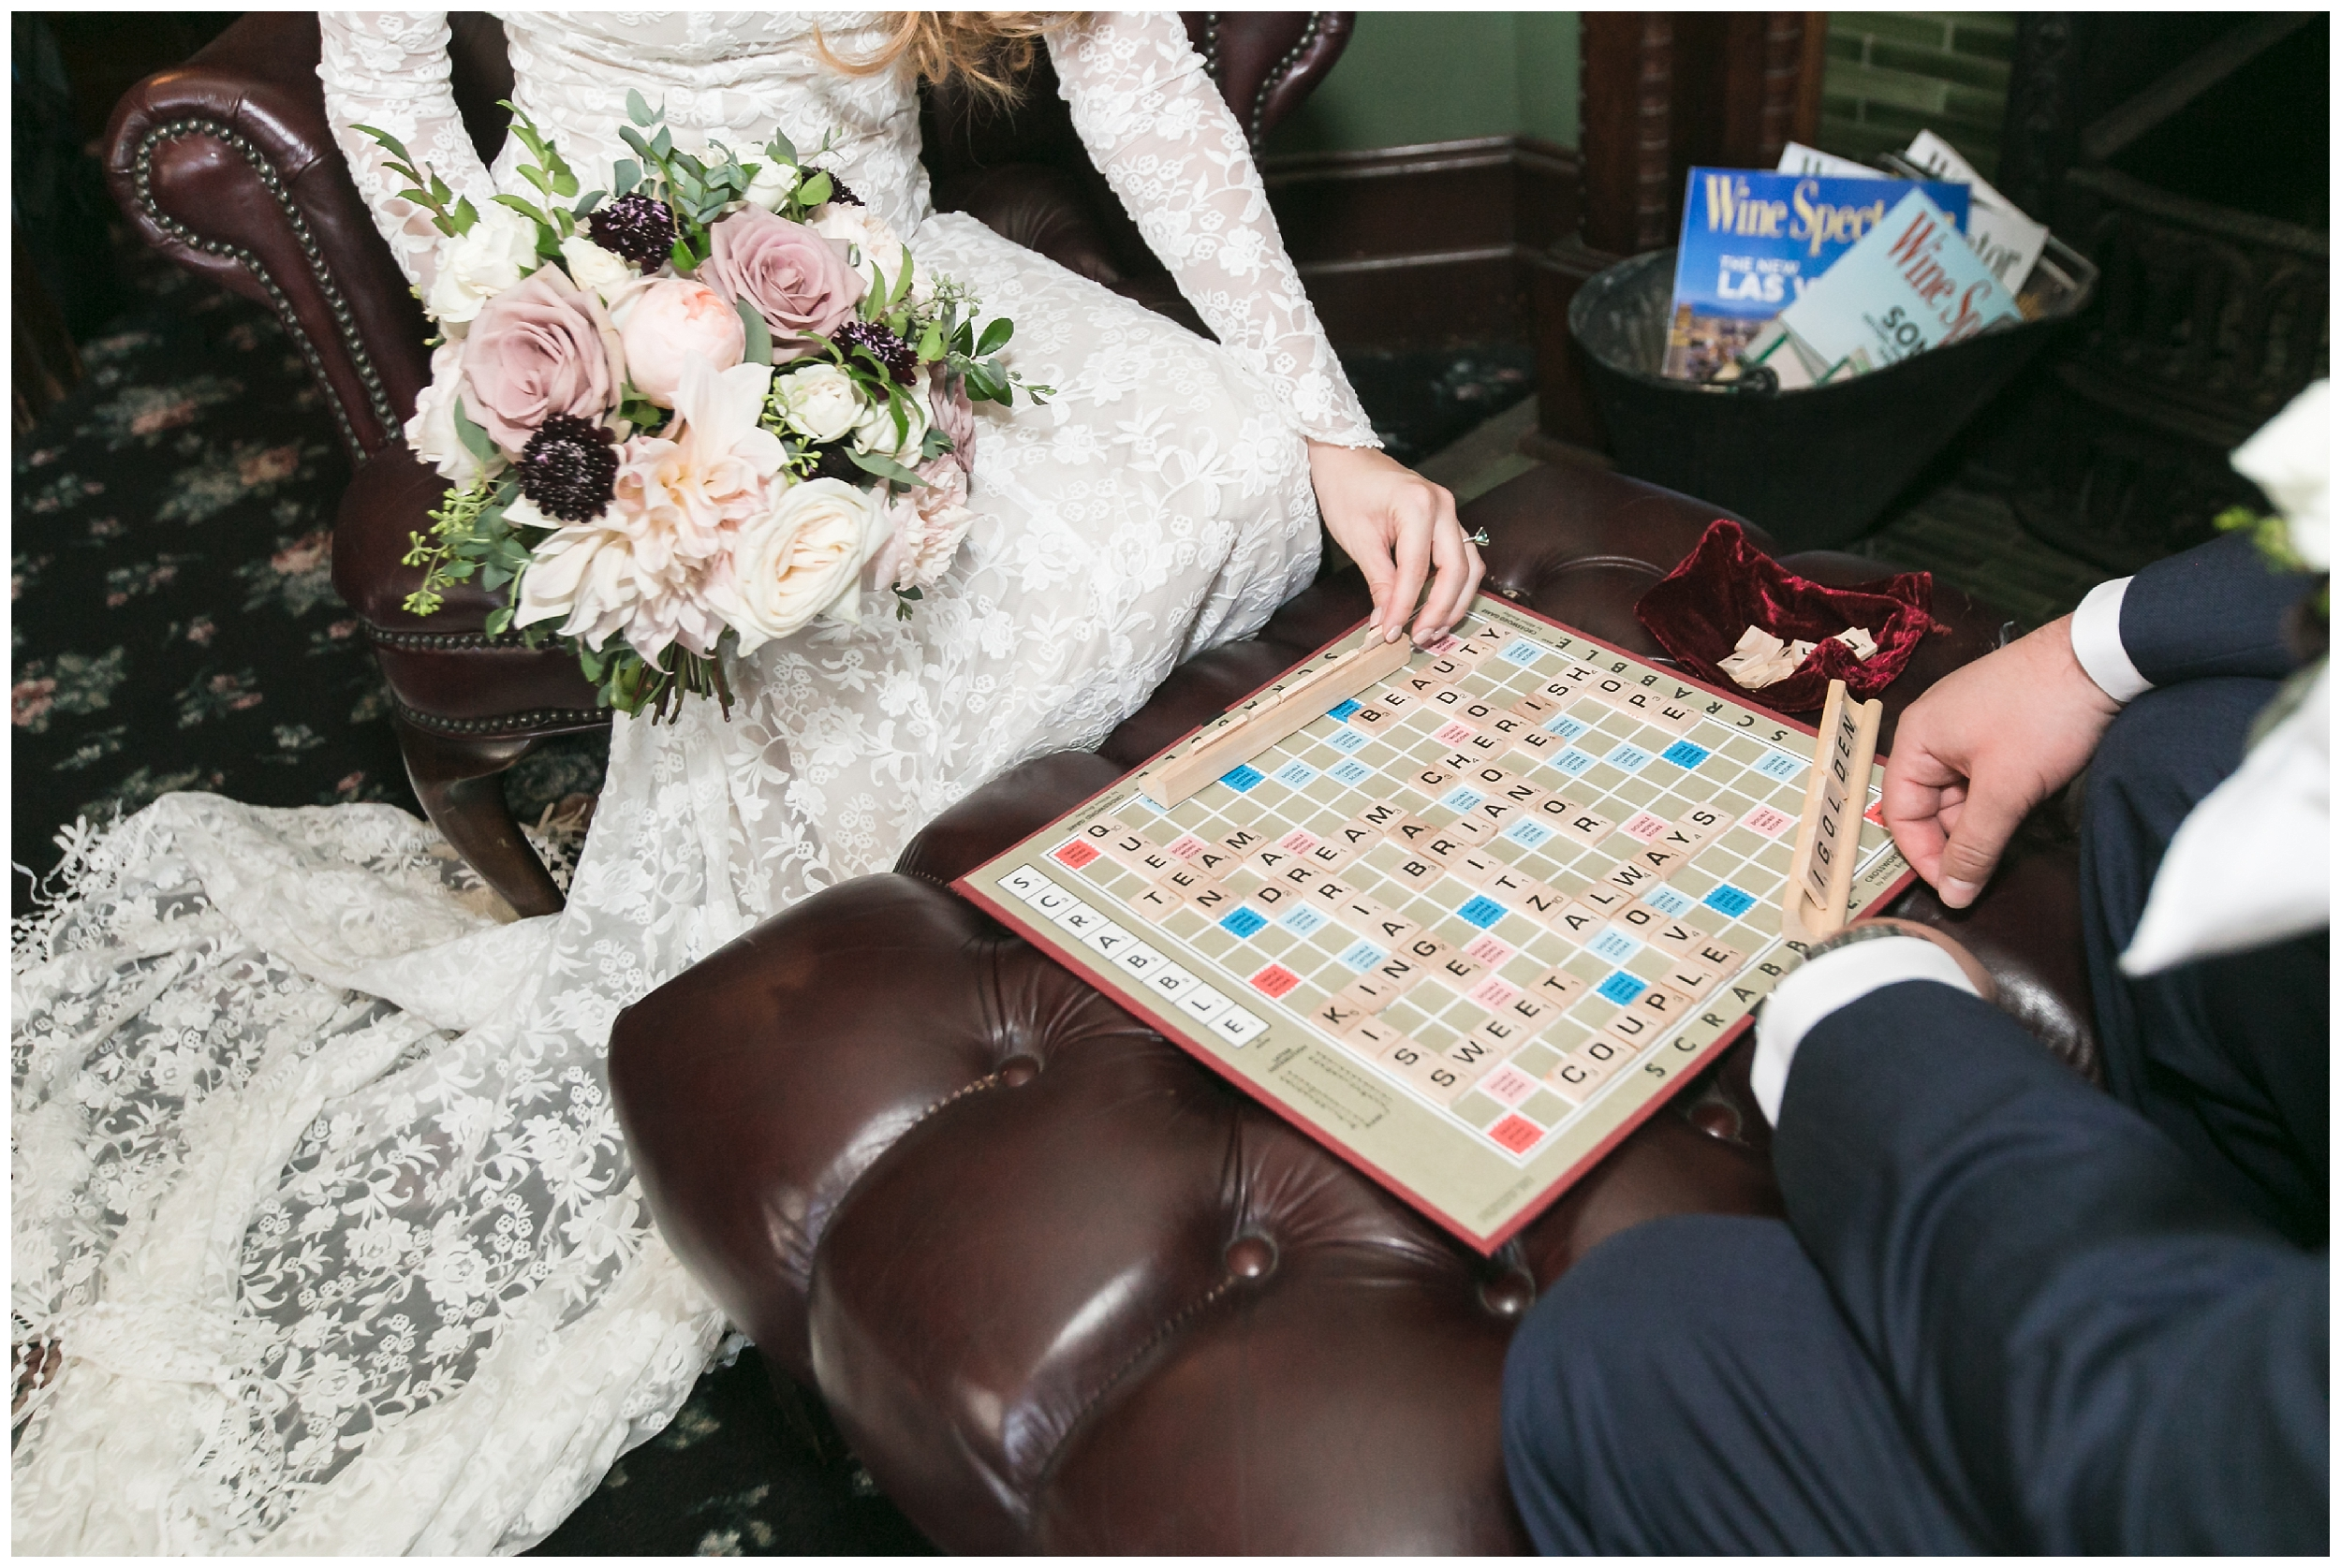 chic-christmas-house-wedding-bride-groom-scrabble-carrie-vines-005.jpg